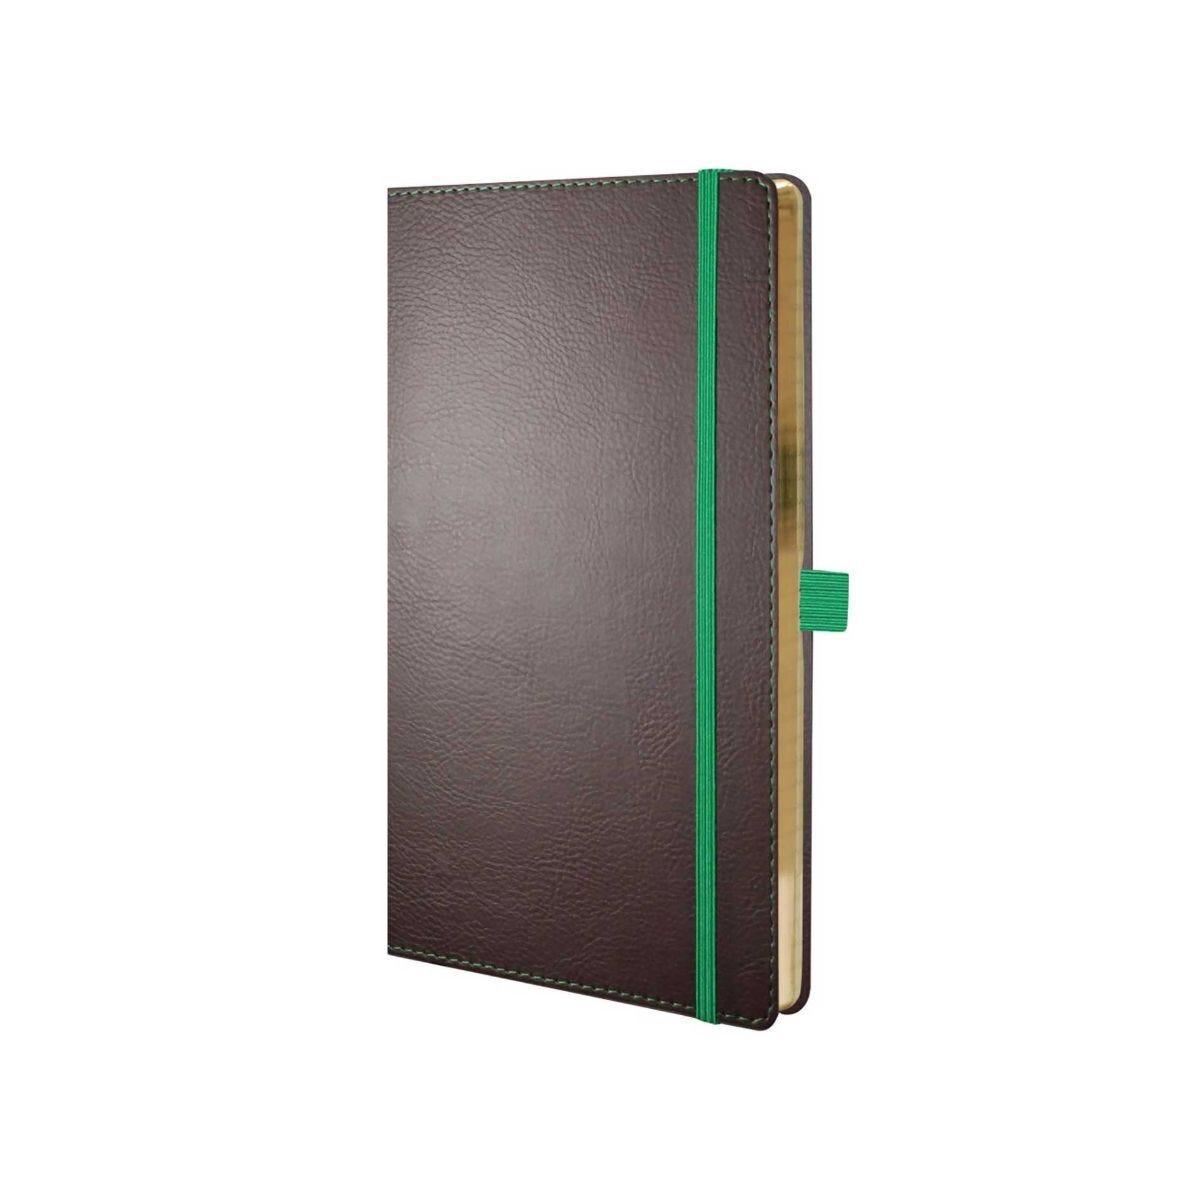 Castelli Ivory Phoenix Notebook Medium Ruled Brown/Green